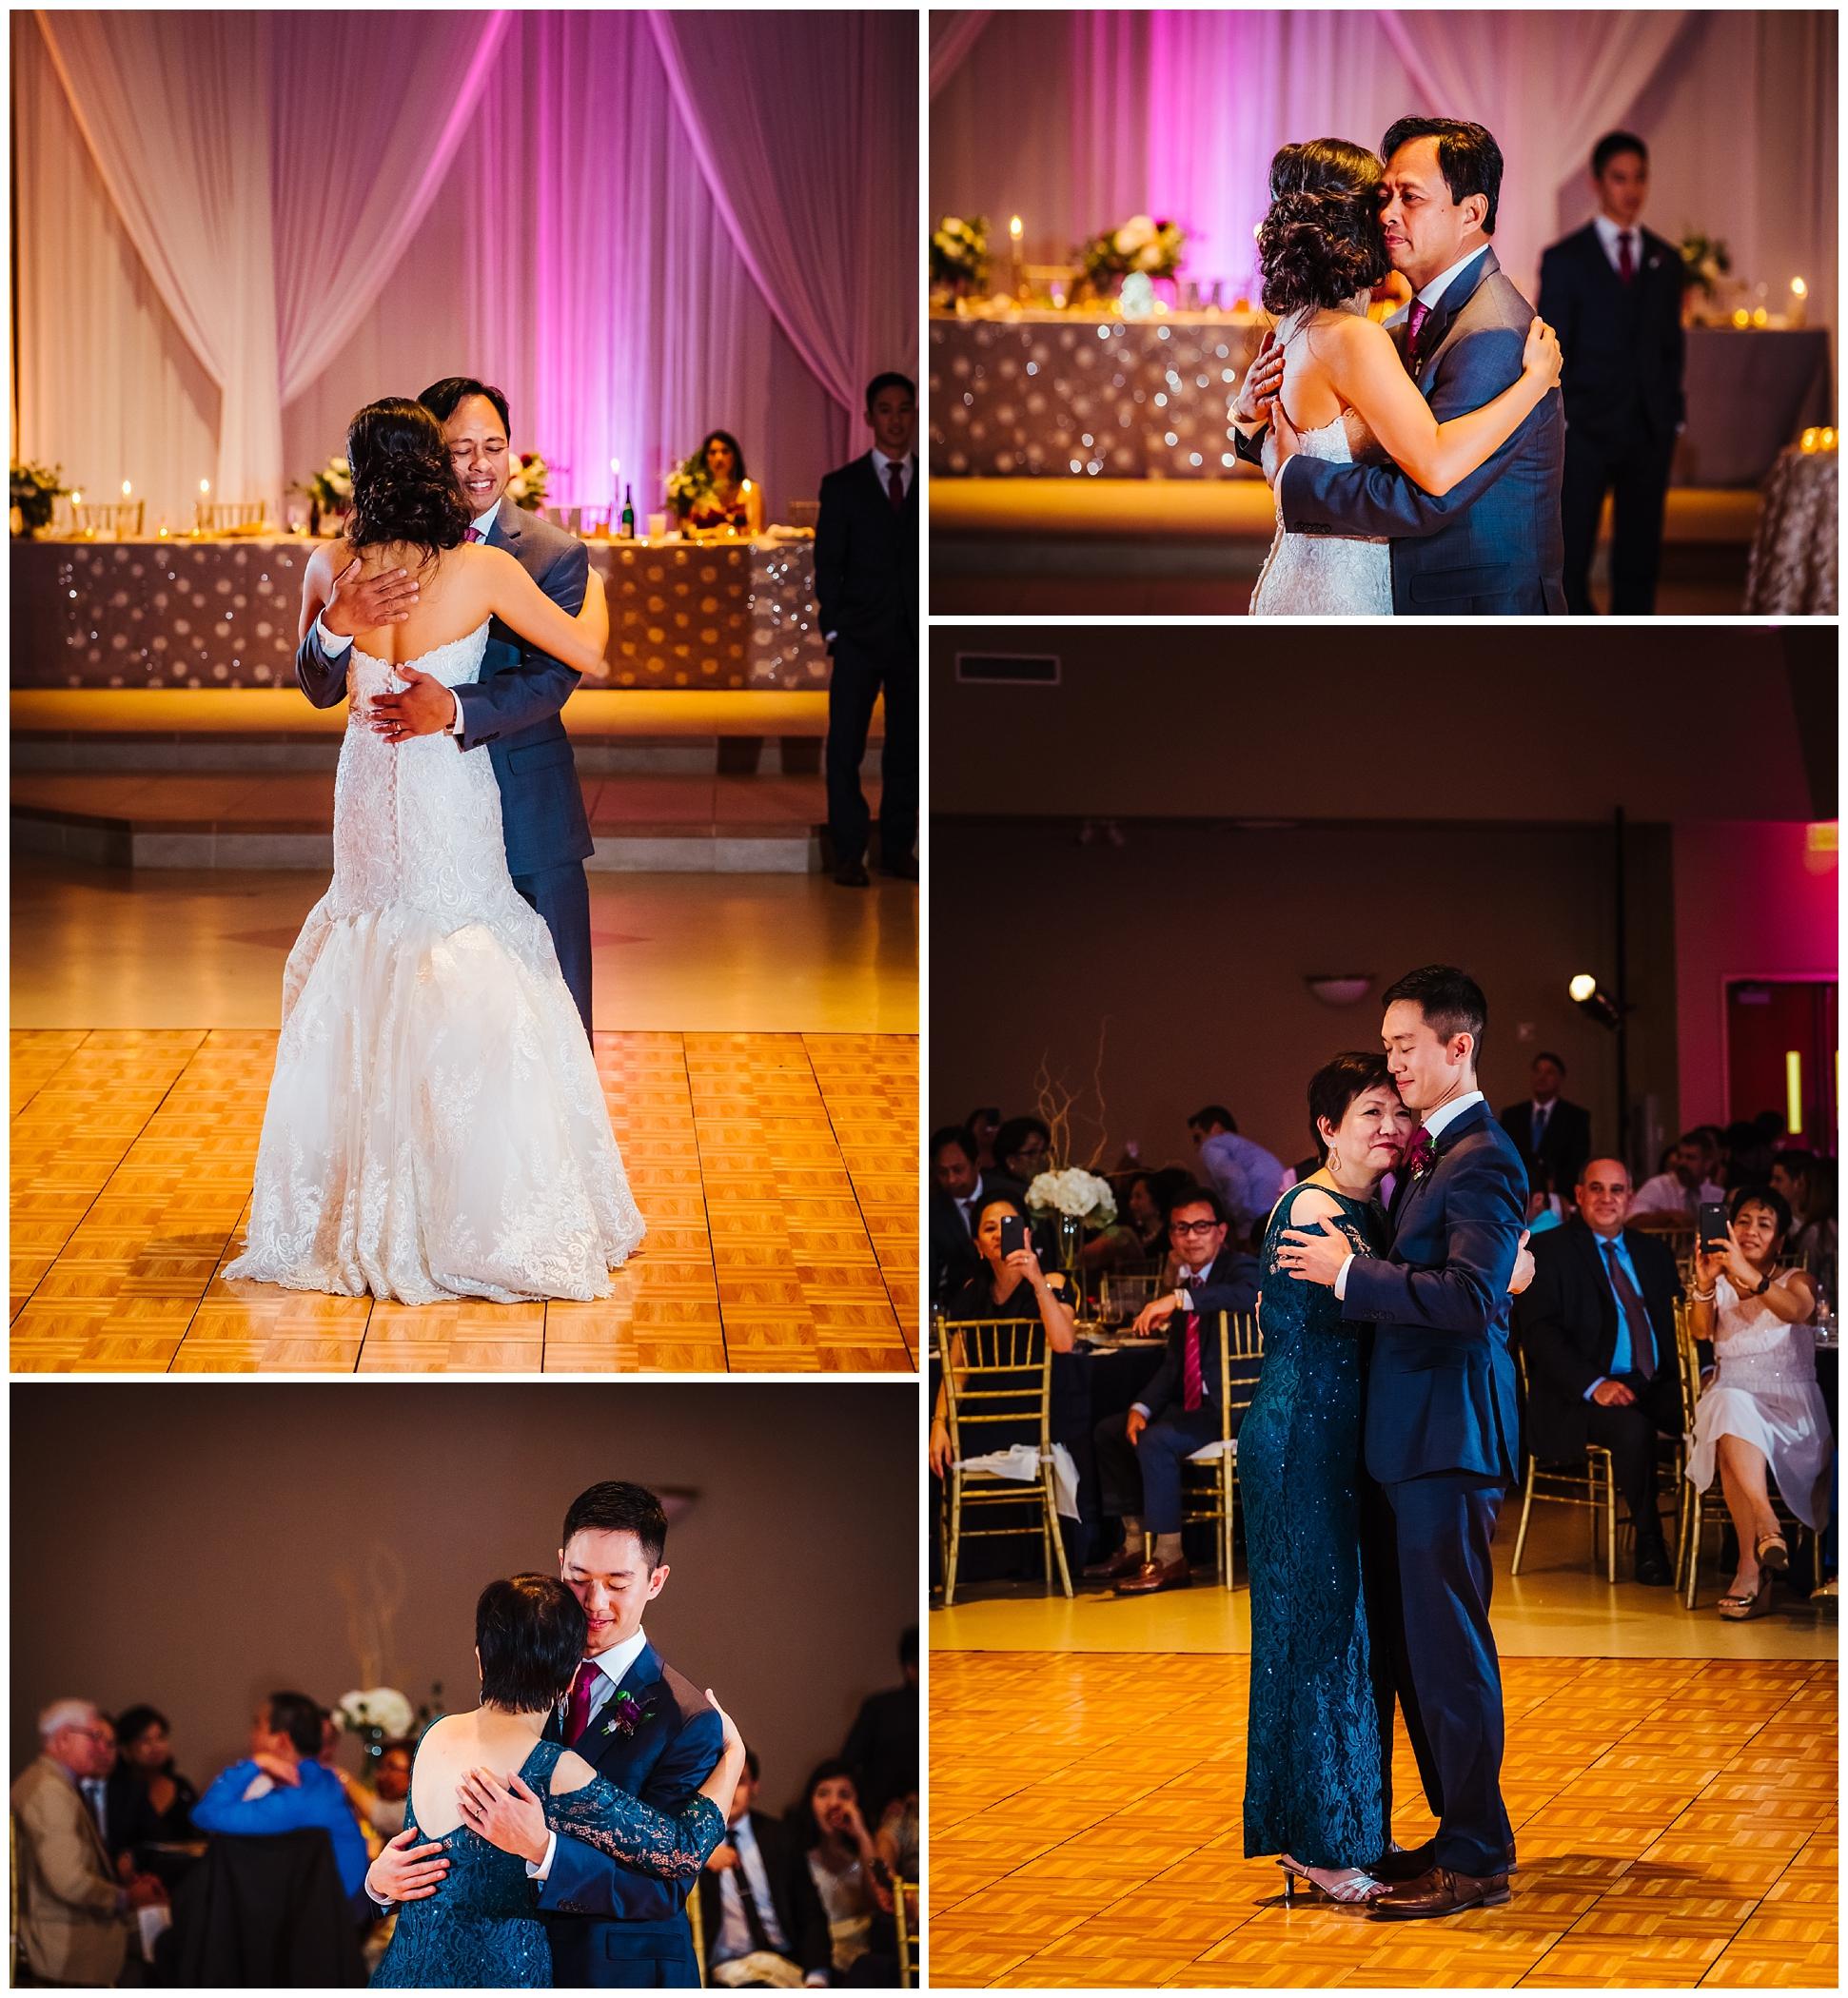 tampa-wedding-photographer-philipino-colorful-woods-ballroom-church-mass-confetti-fuscia_0071.jpg